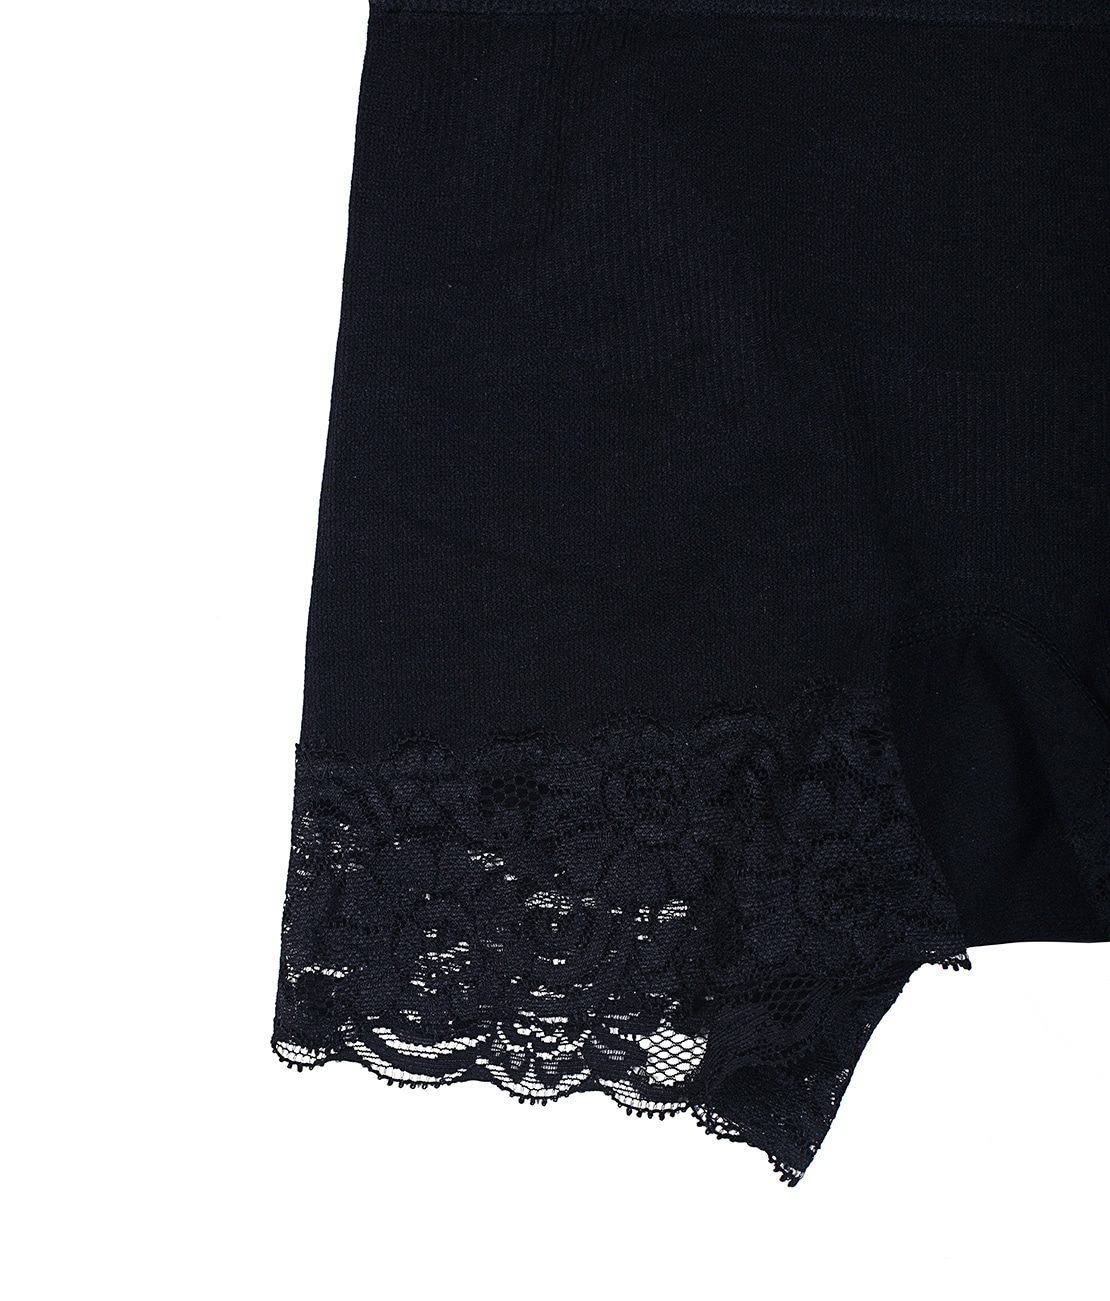 Panty Taille Haute Noir Packshot Detail 1